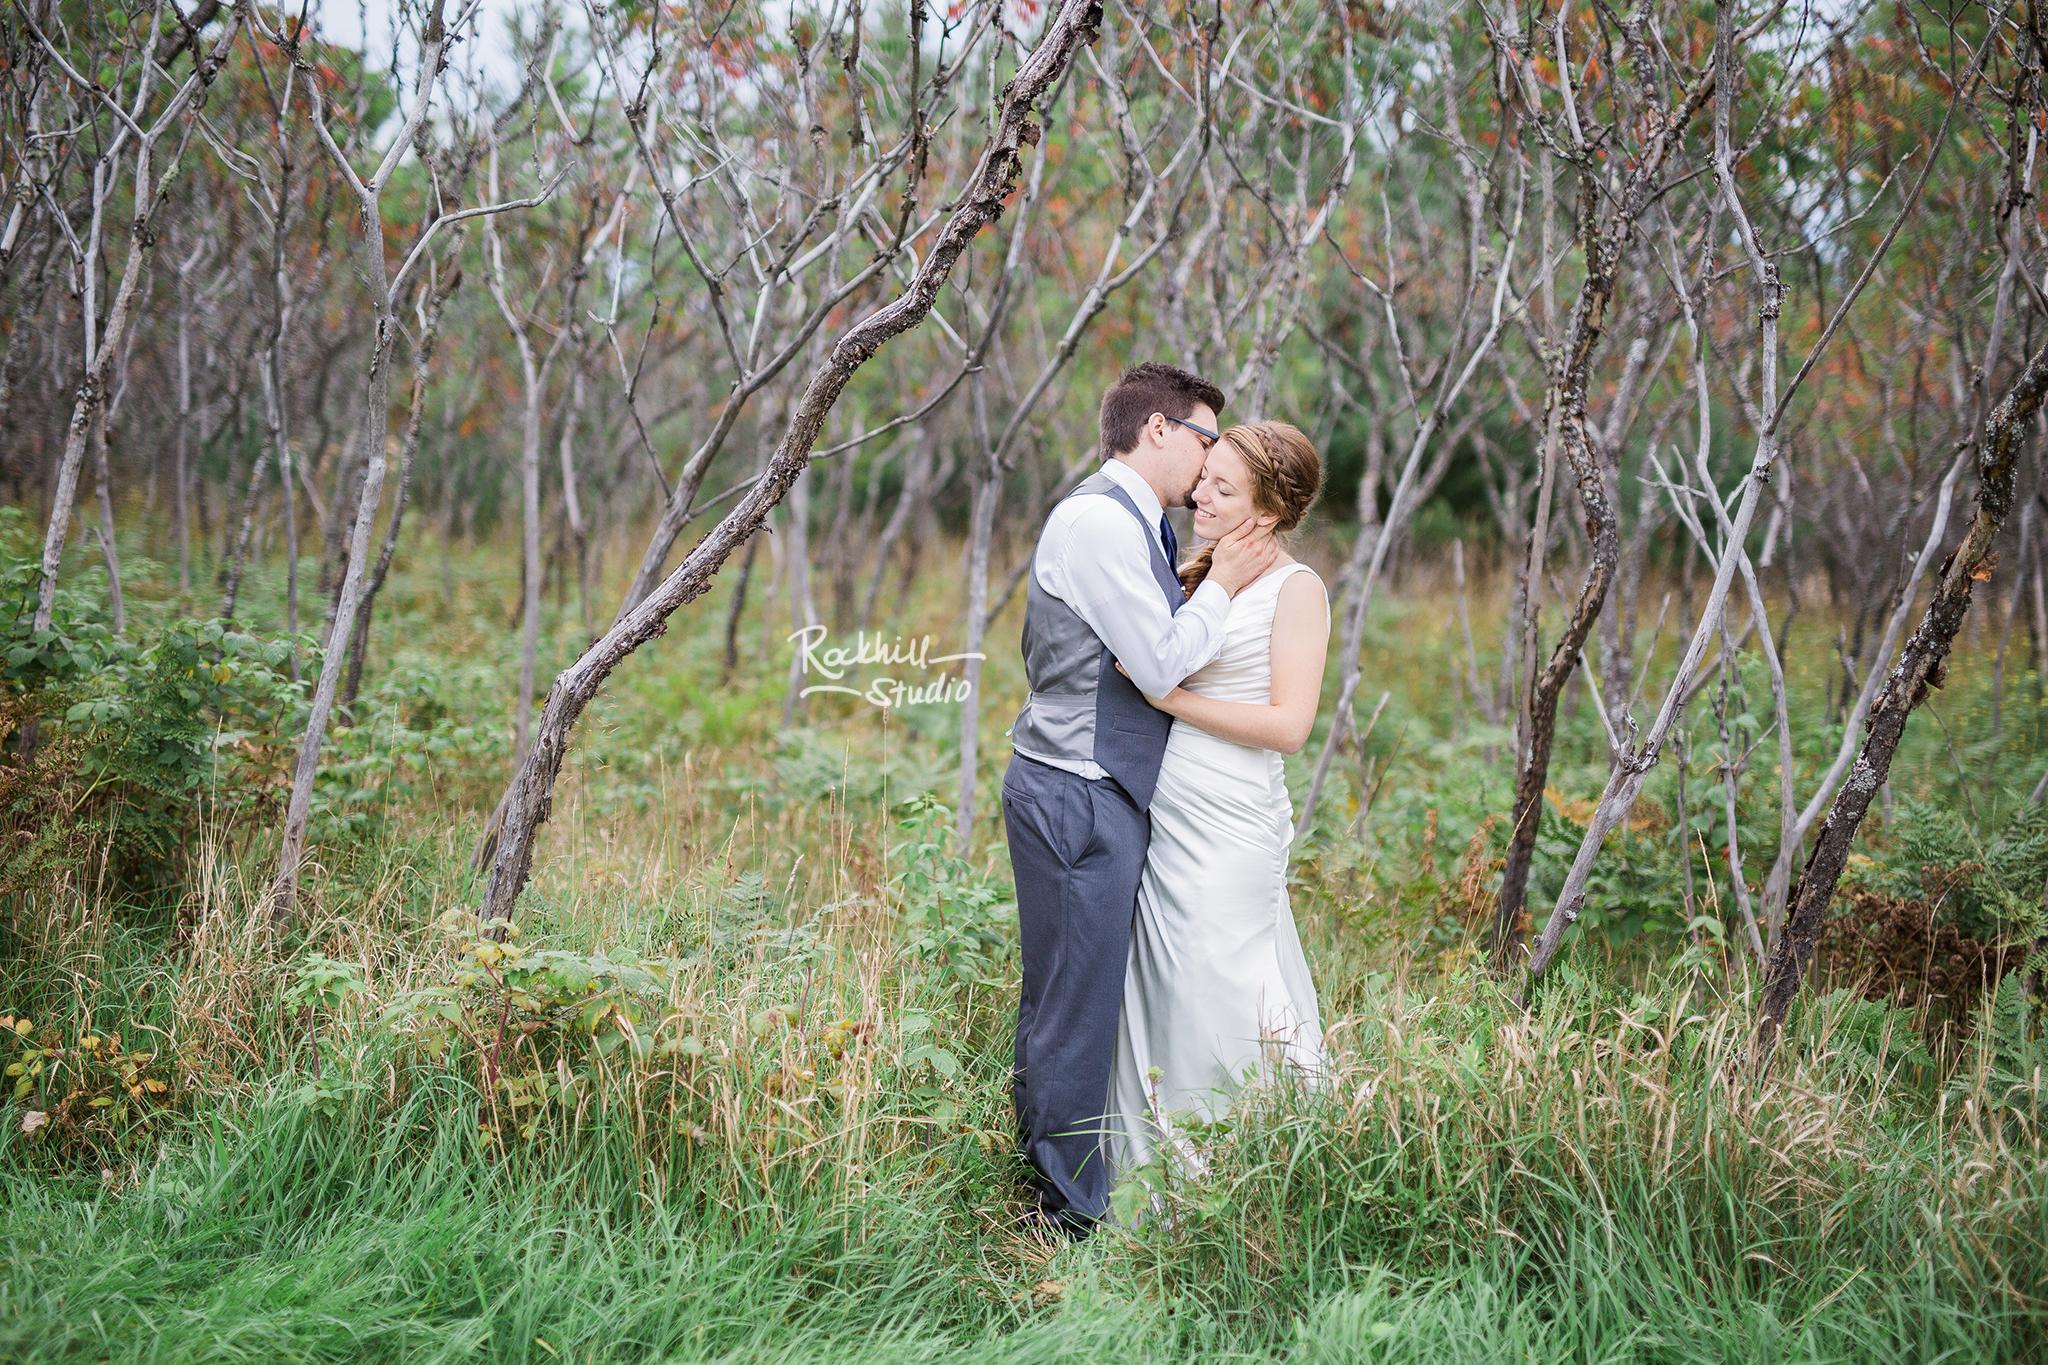 northern-michigan-wedding-photograher-traverse-city-upper-peninsula-michigan-rockhill-1.jpg